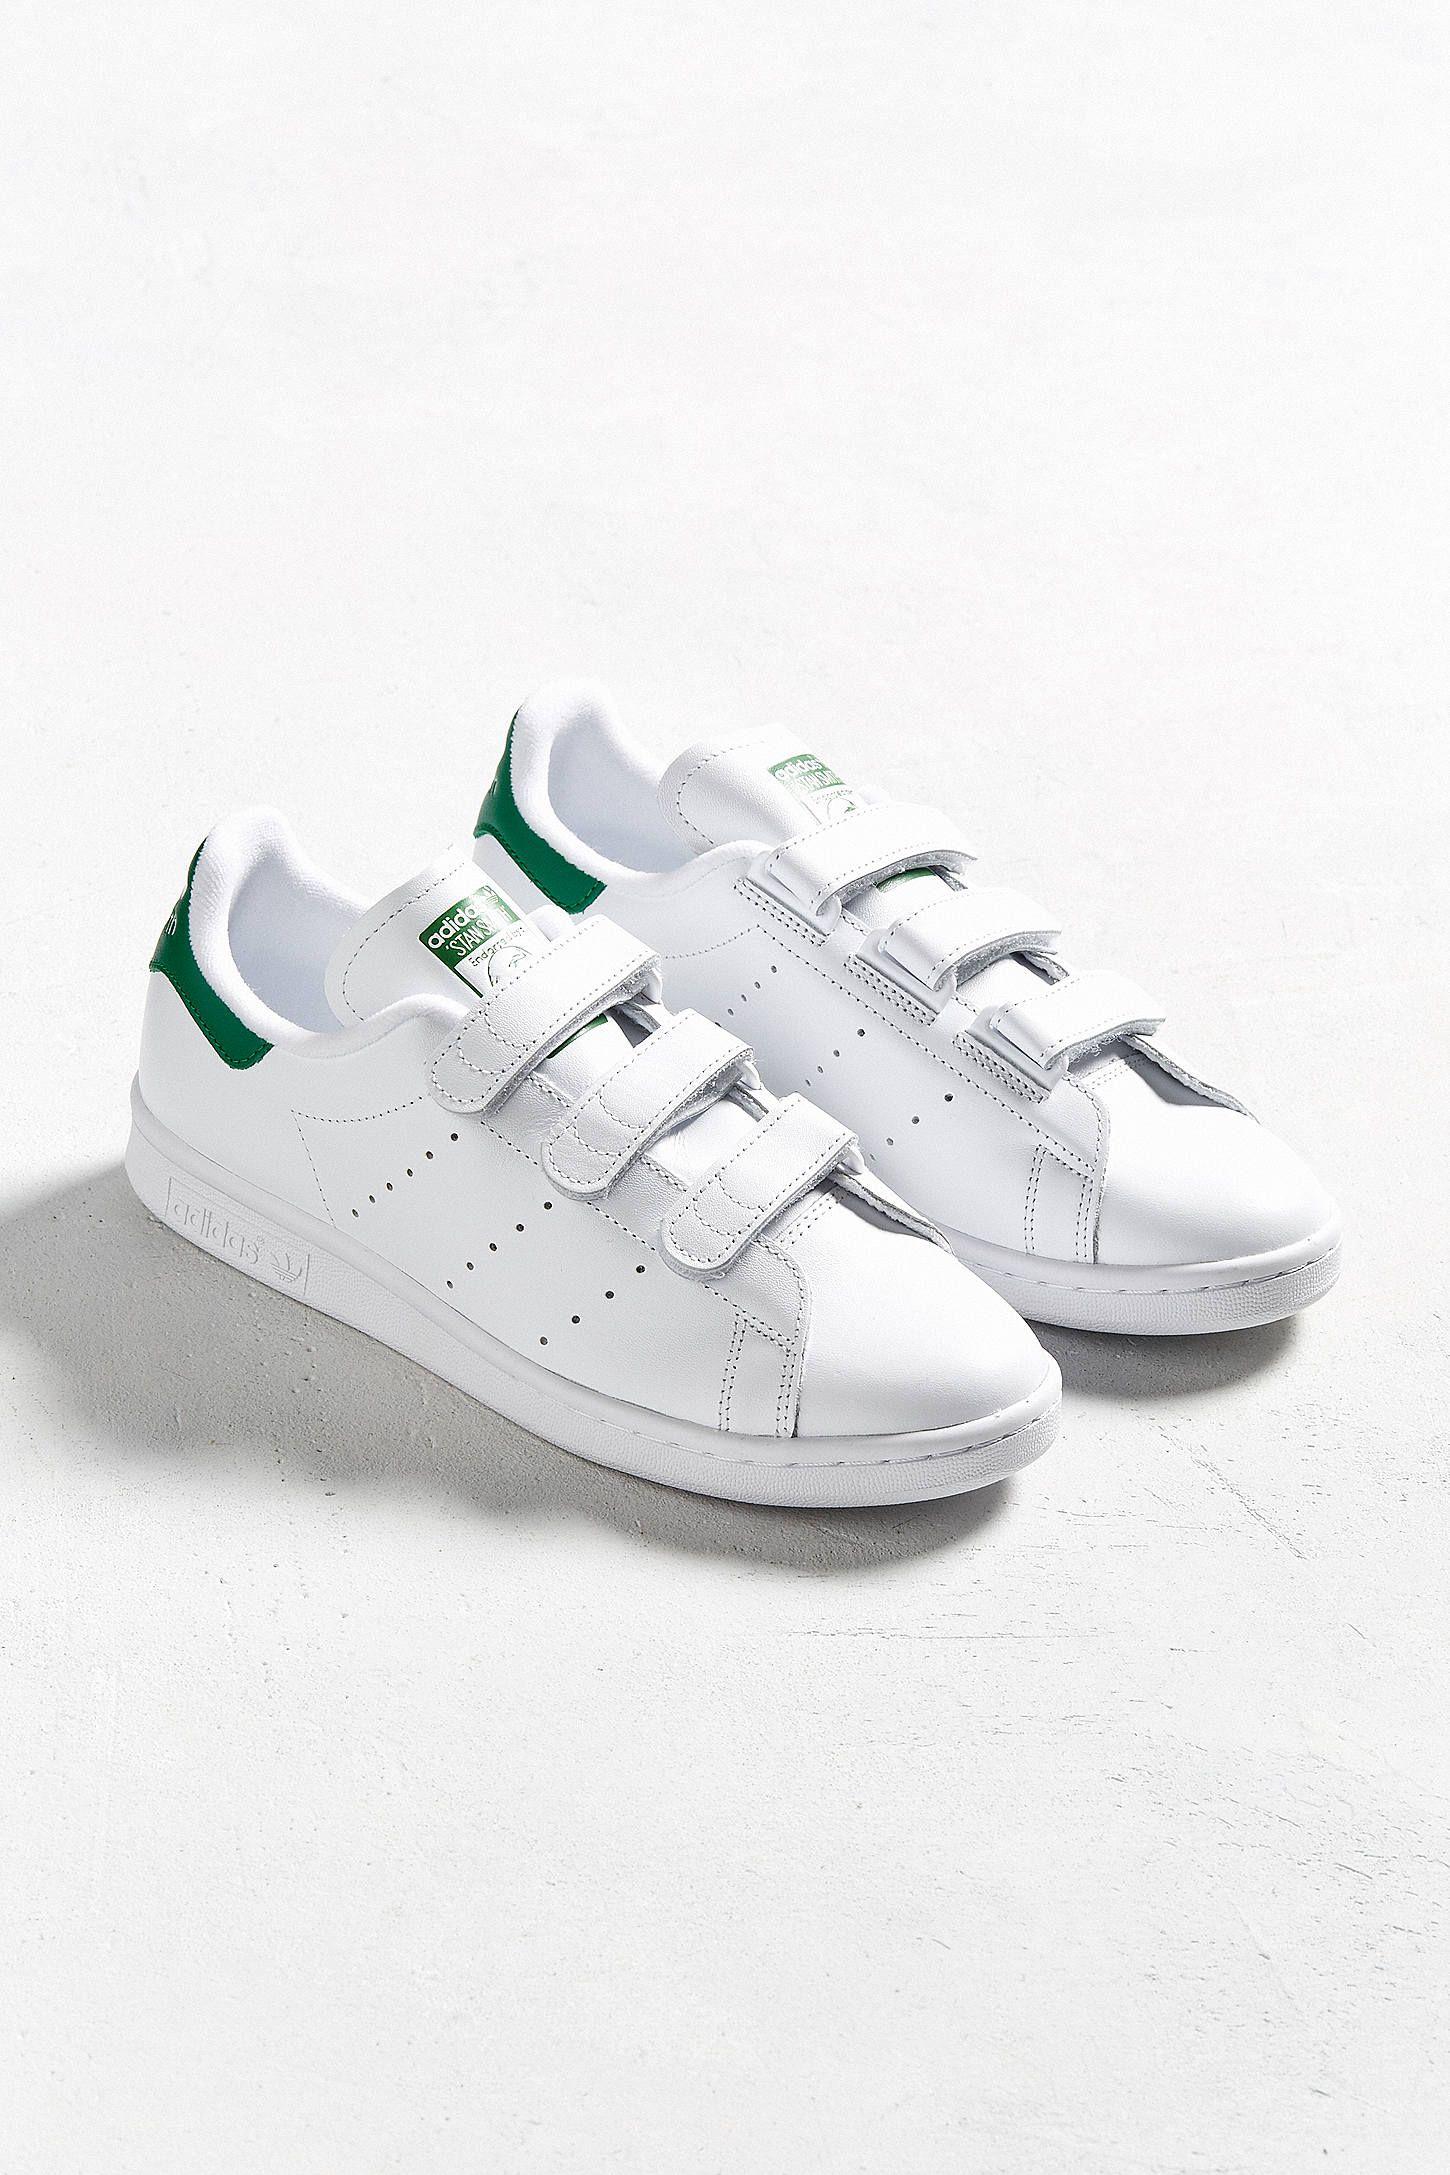 Jason Markk Quick Wipes   Adidas stan